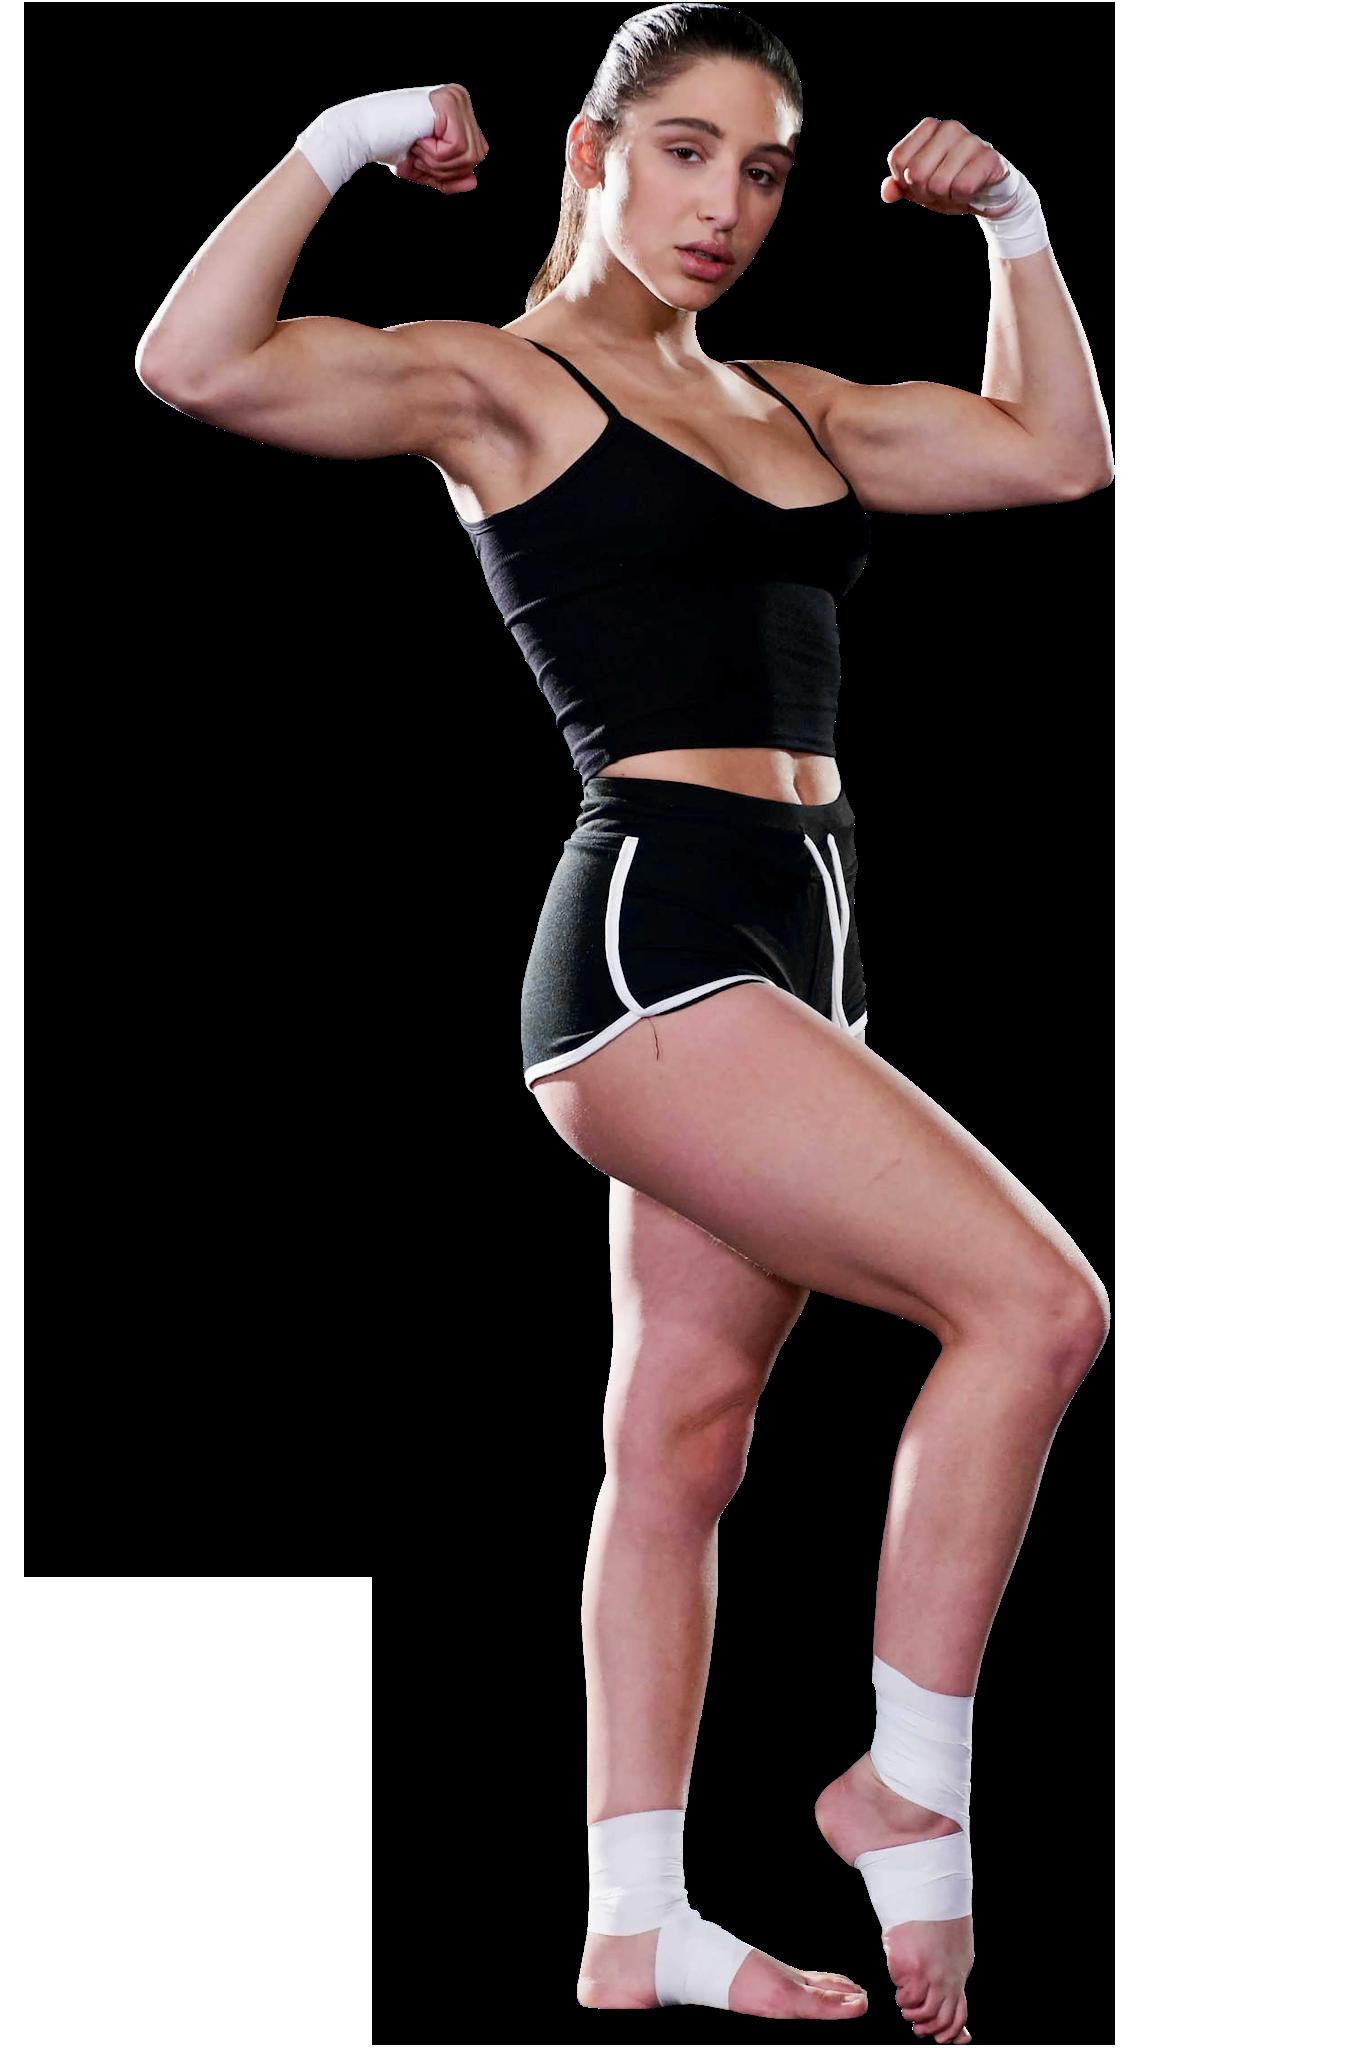 Abella Danger Muscle Pose PNG Image